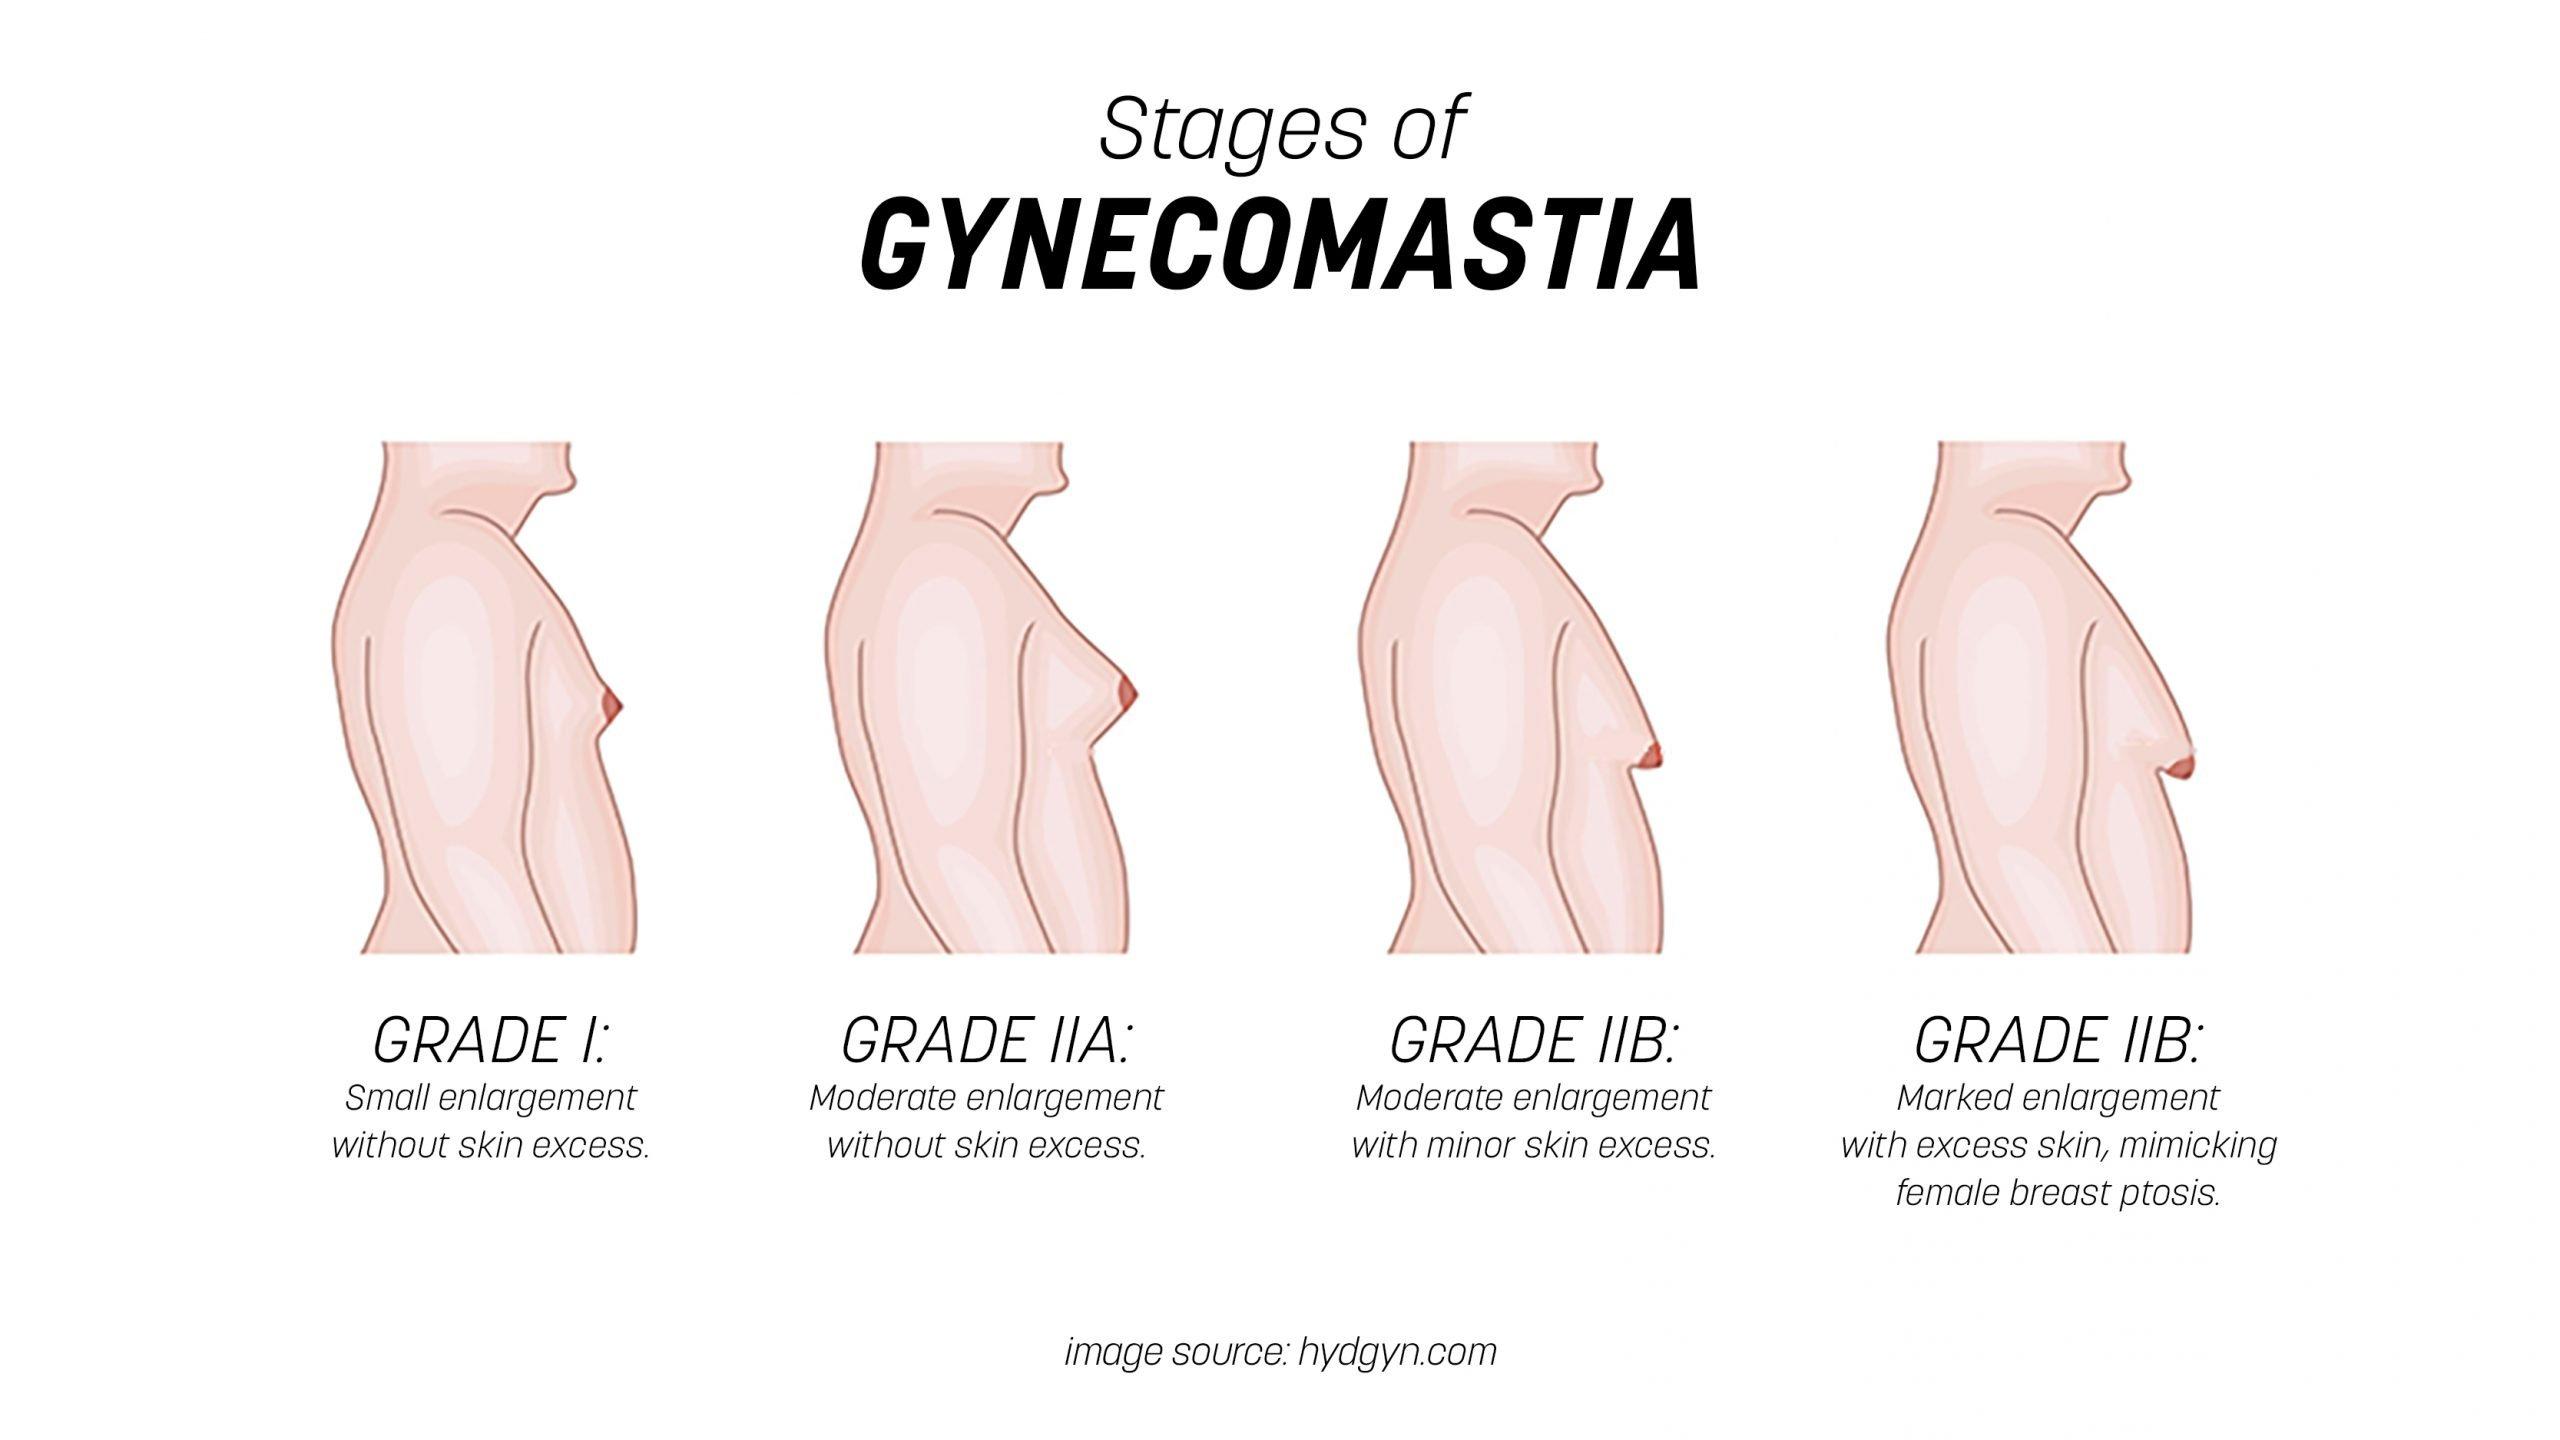 Stages of Gynecomastia